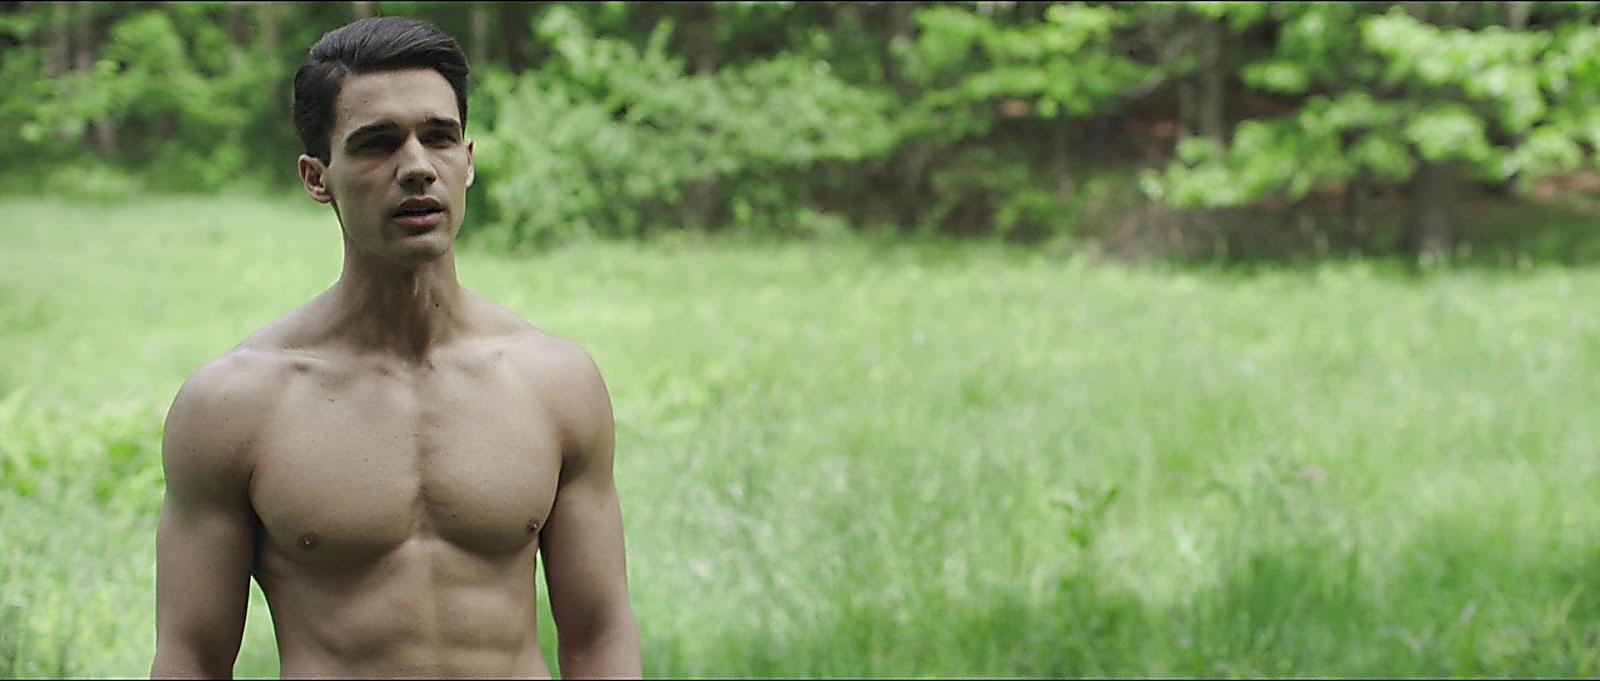 Steven Strait sexy shirtless scene May 14, 2019, 10am